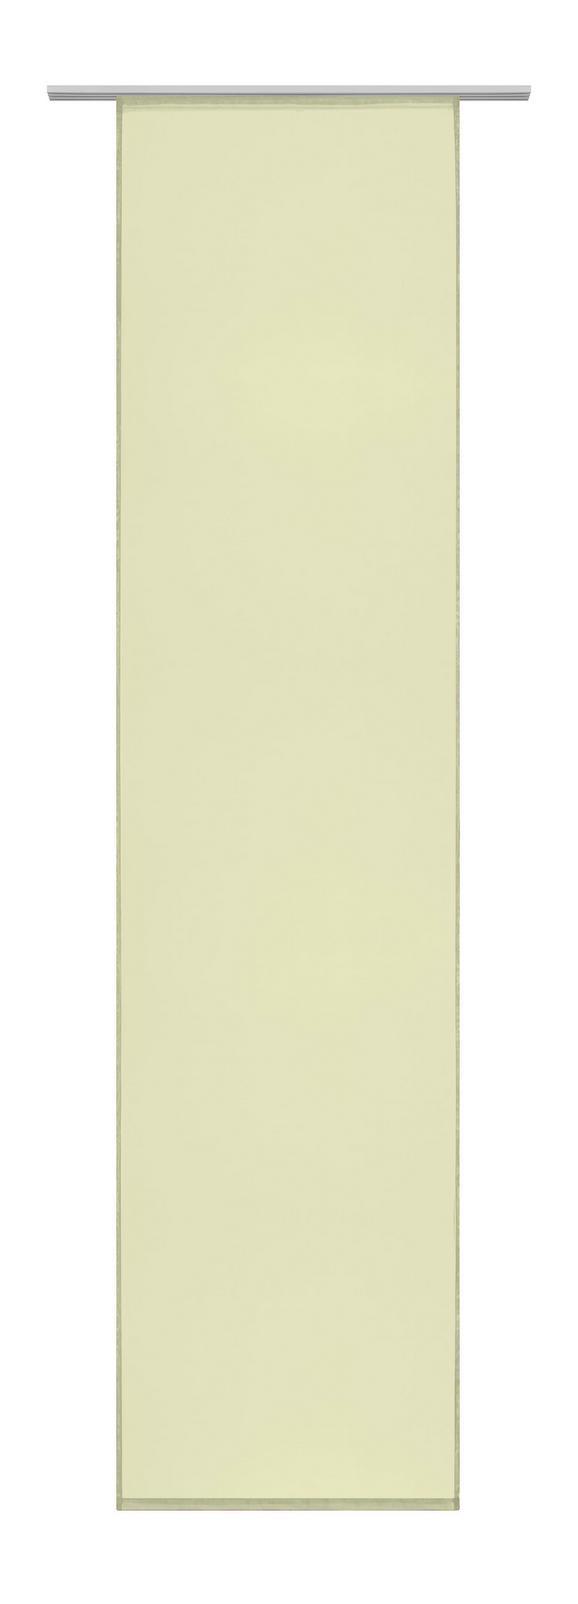 Panelna Zavesa Flipp - zelena, tekstil (60/245cm) - Mömax modern living